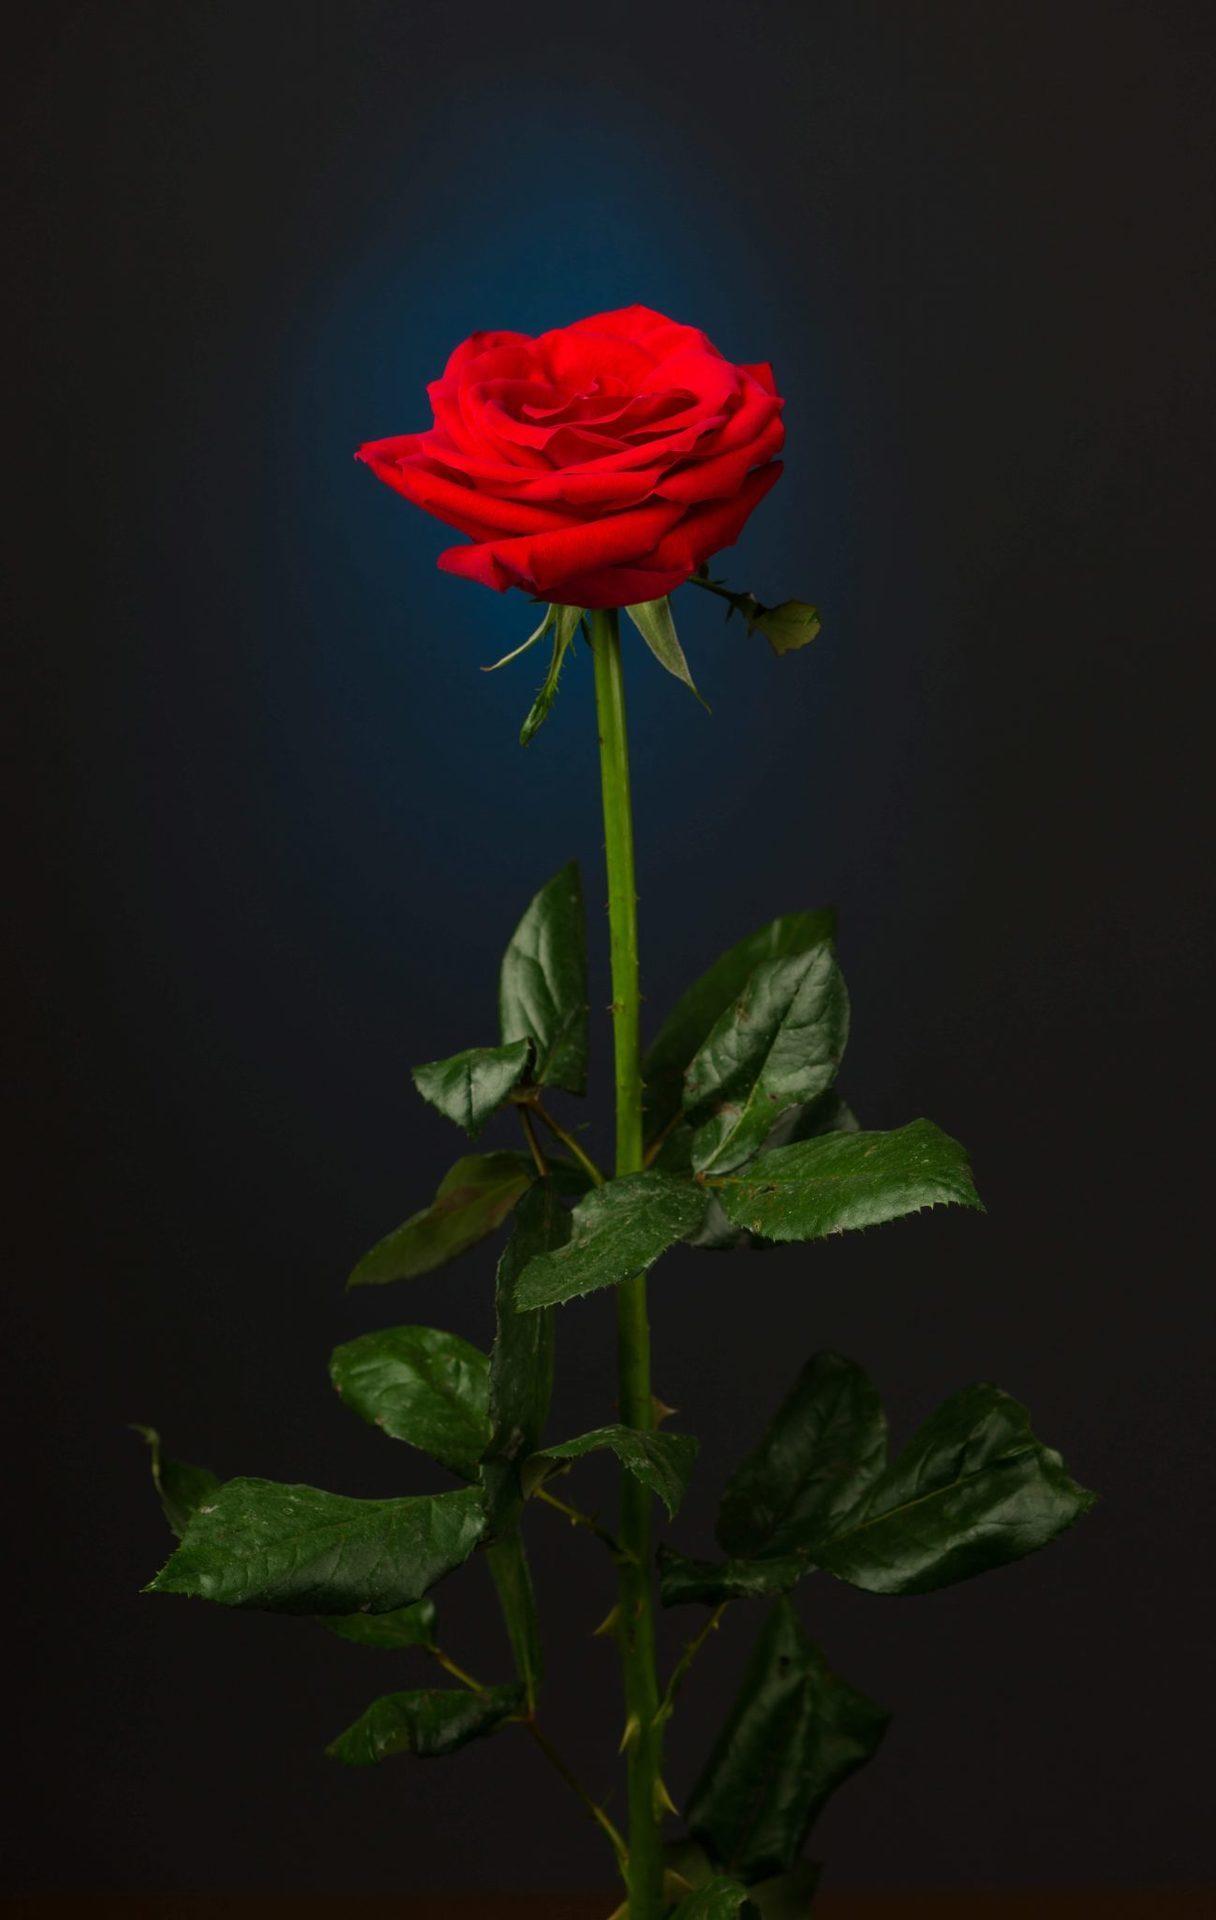 red-rose-on-black-background.jpg